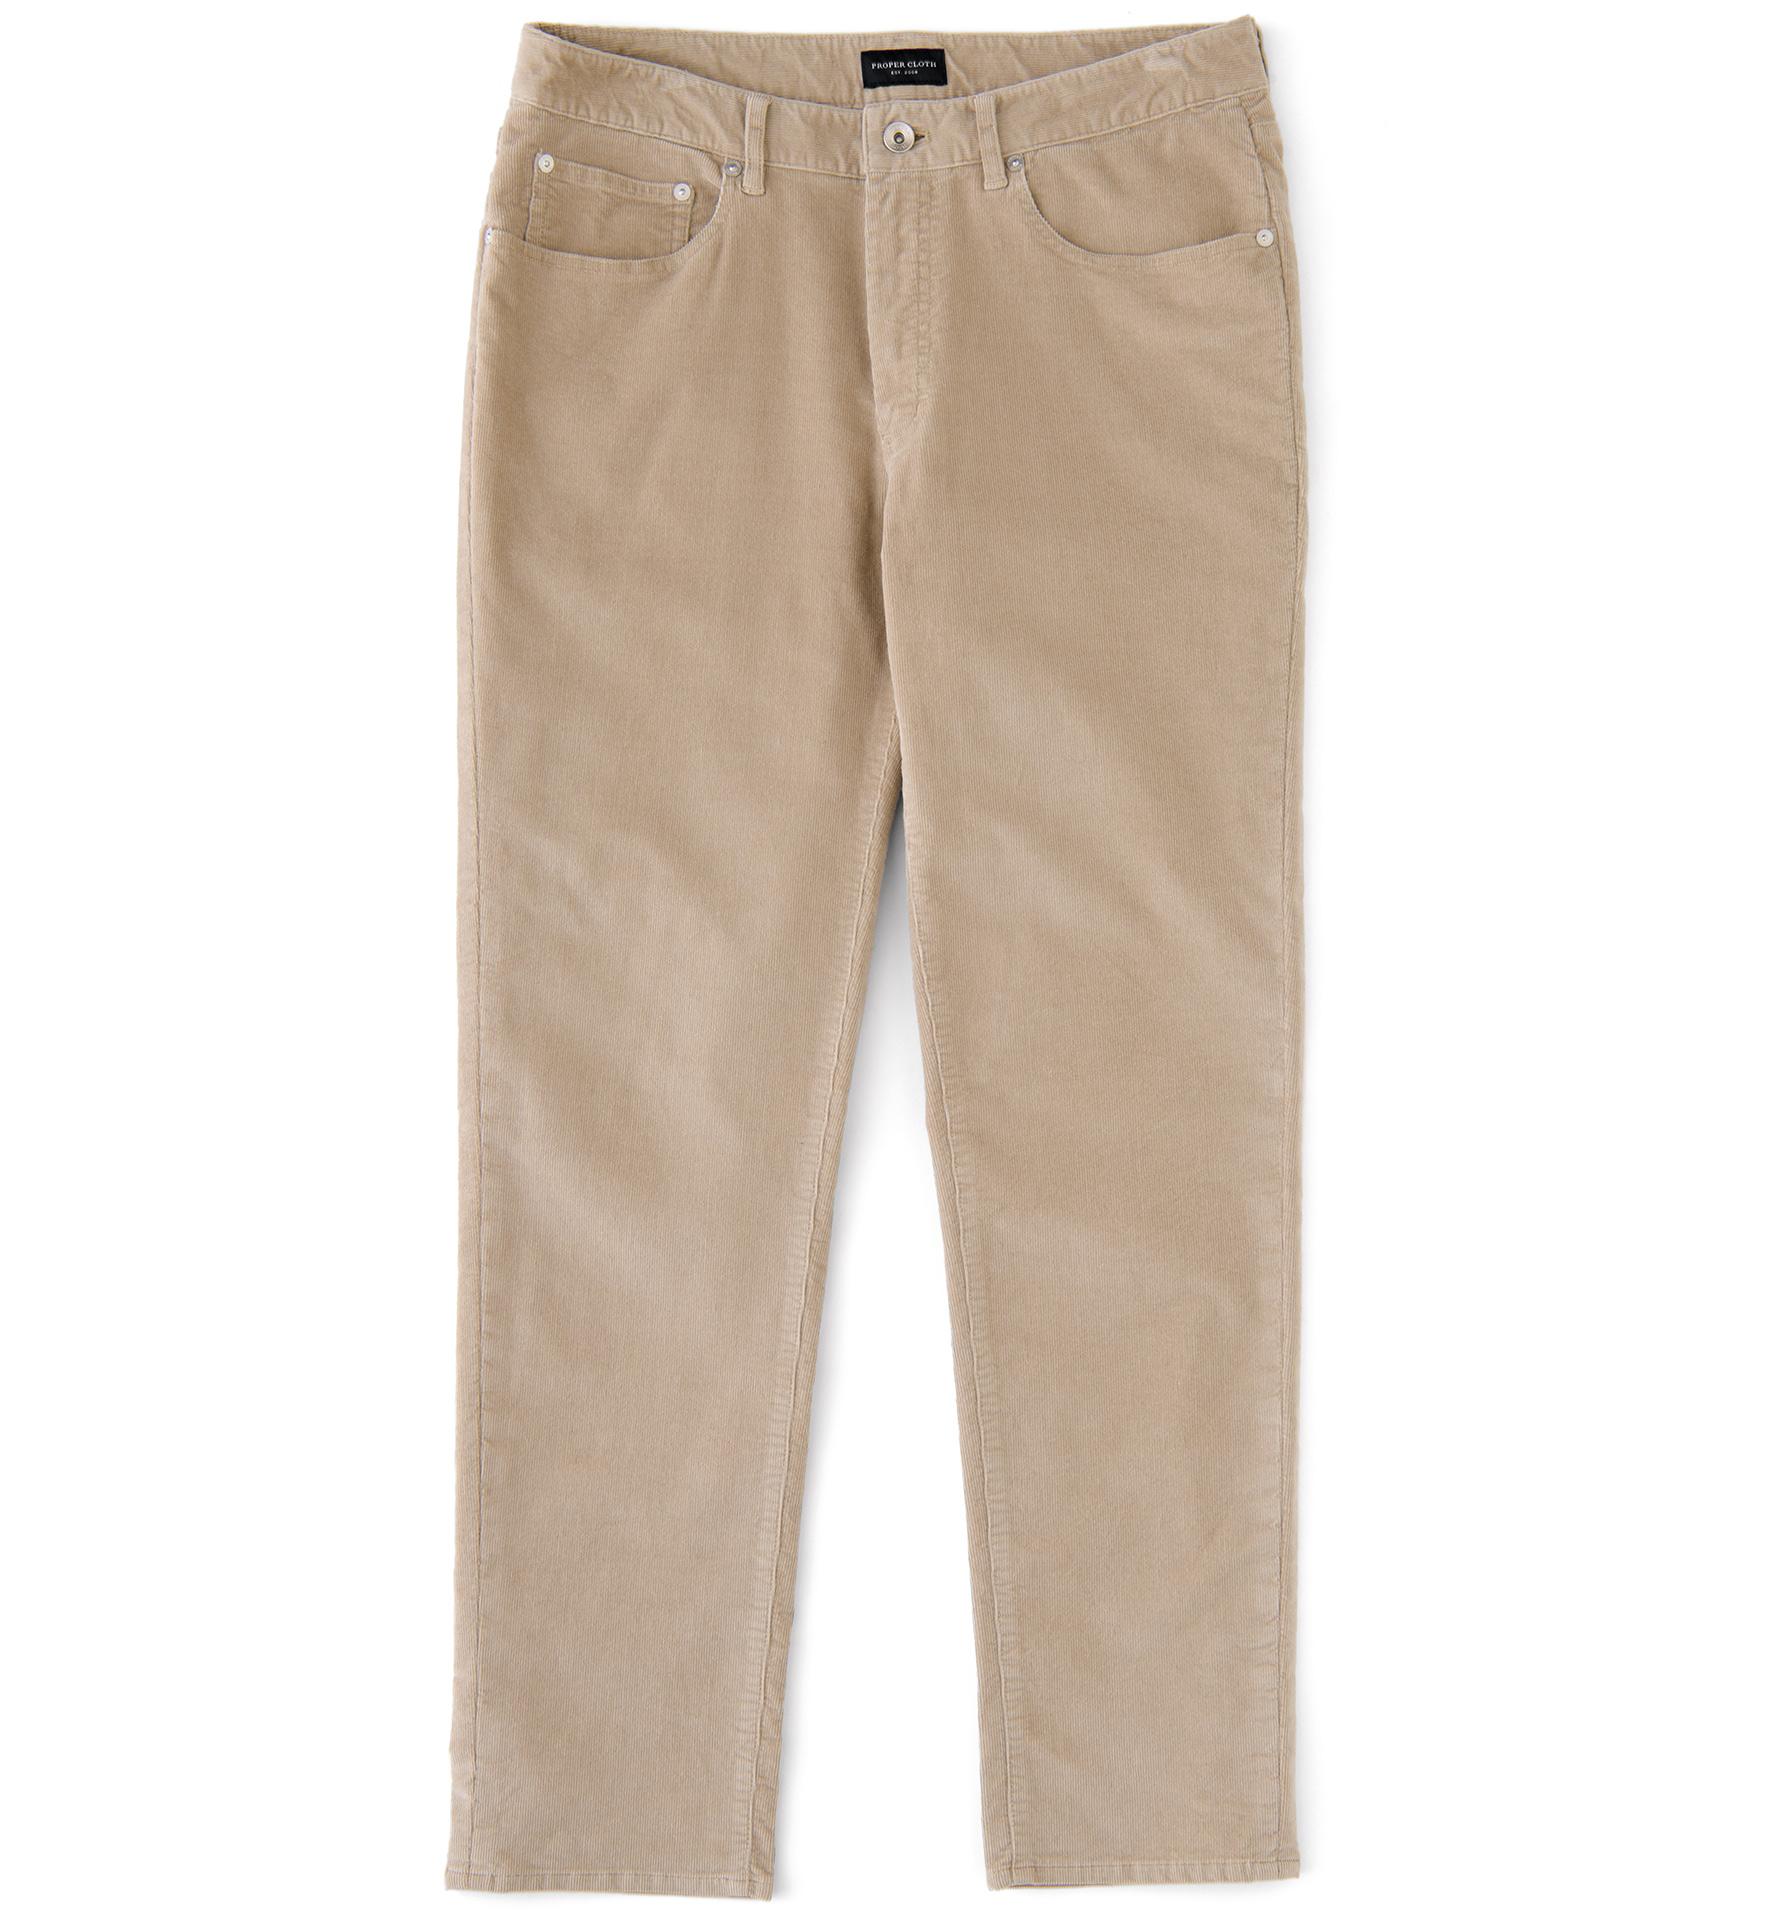 Zoom Image of Sullivan Sand Stretch Corduroy 5-Pocket Pant